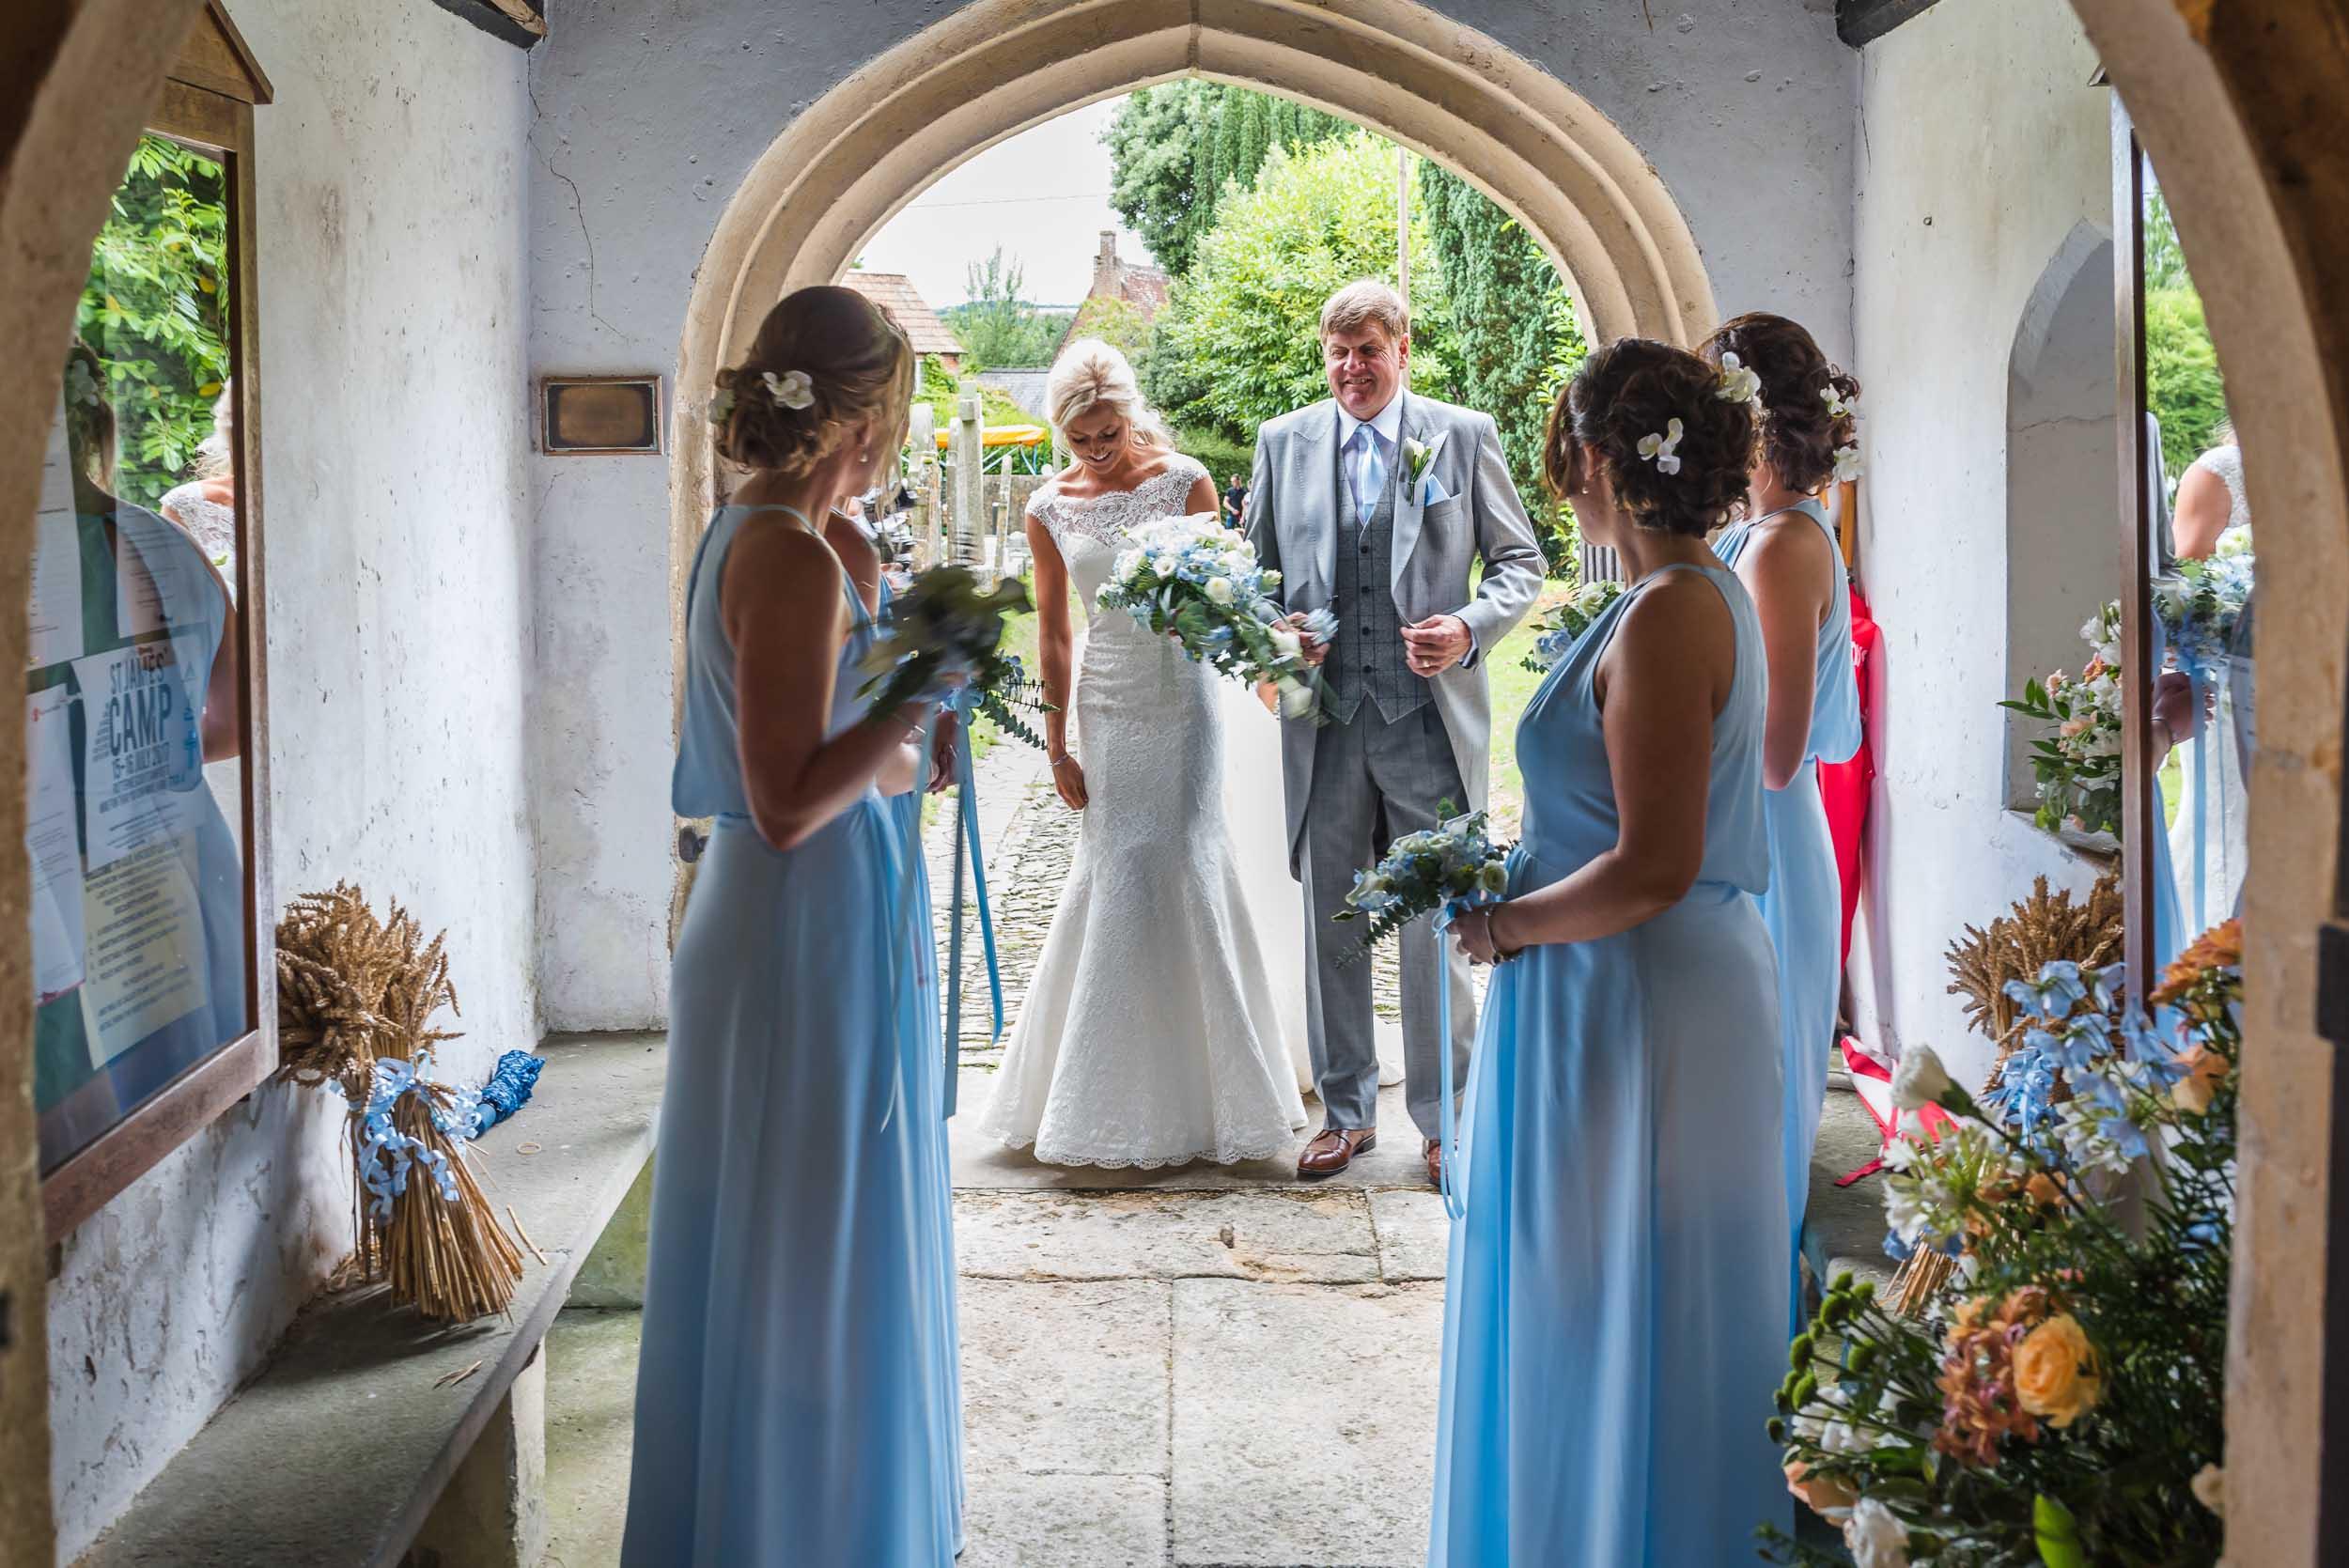 NC-20170722-sophie-and-jonny-wedding-1297.jpg